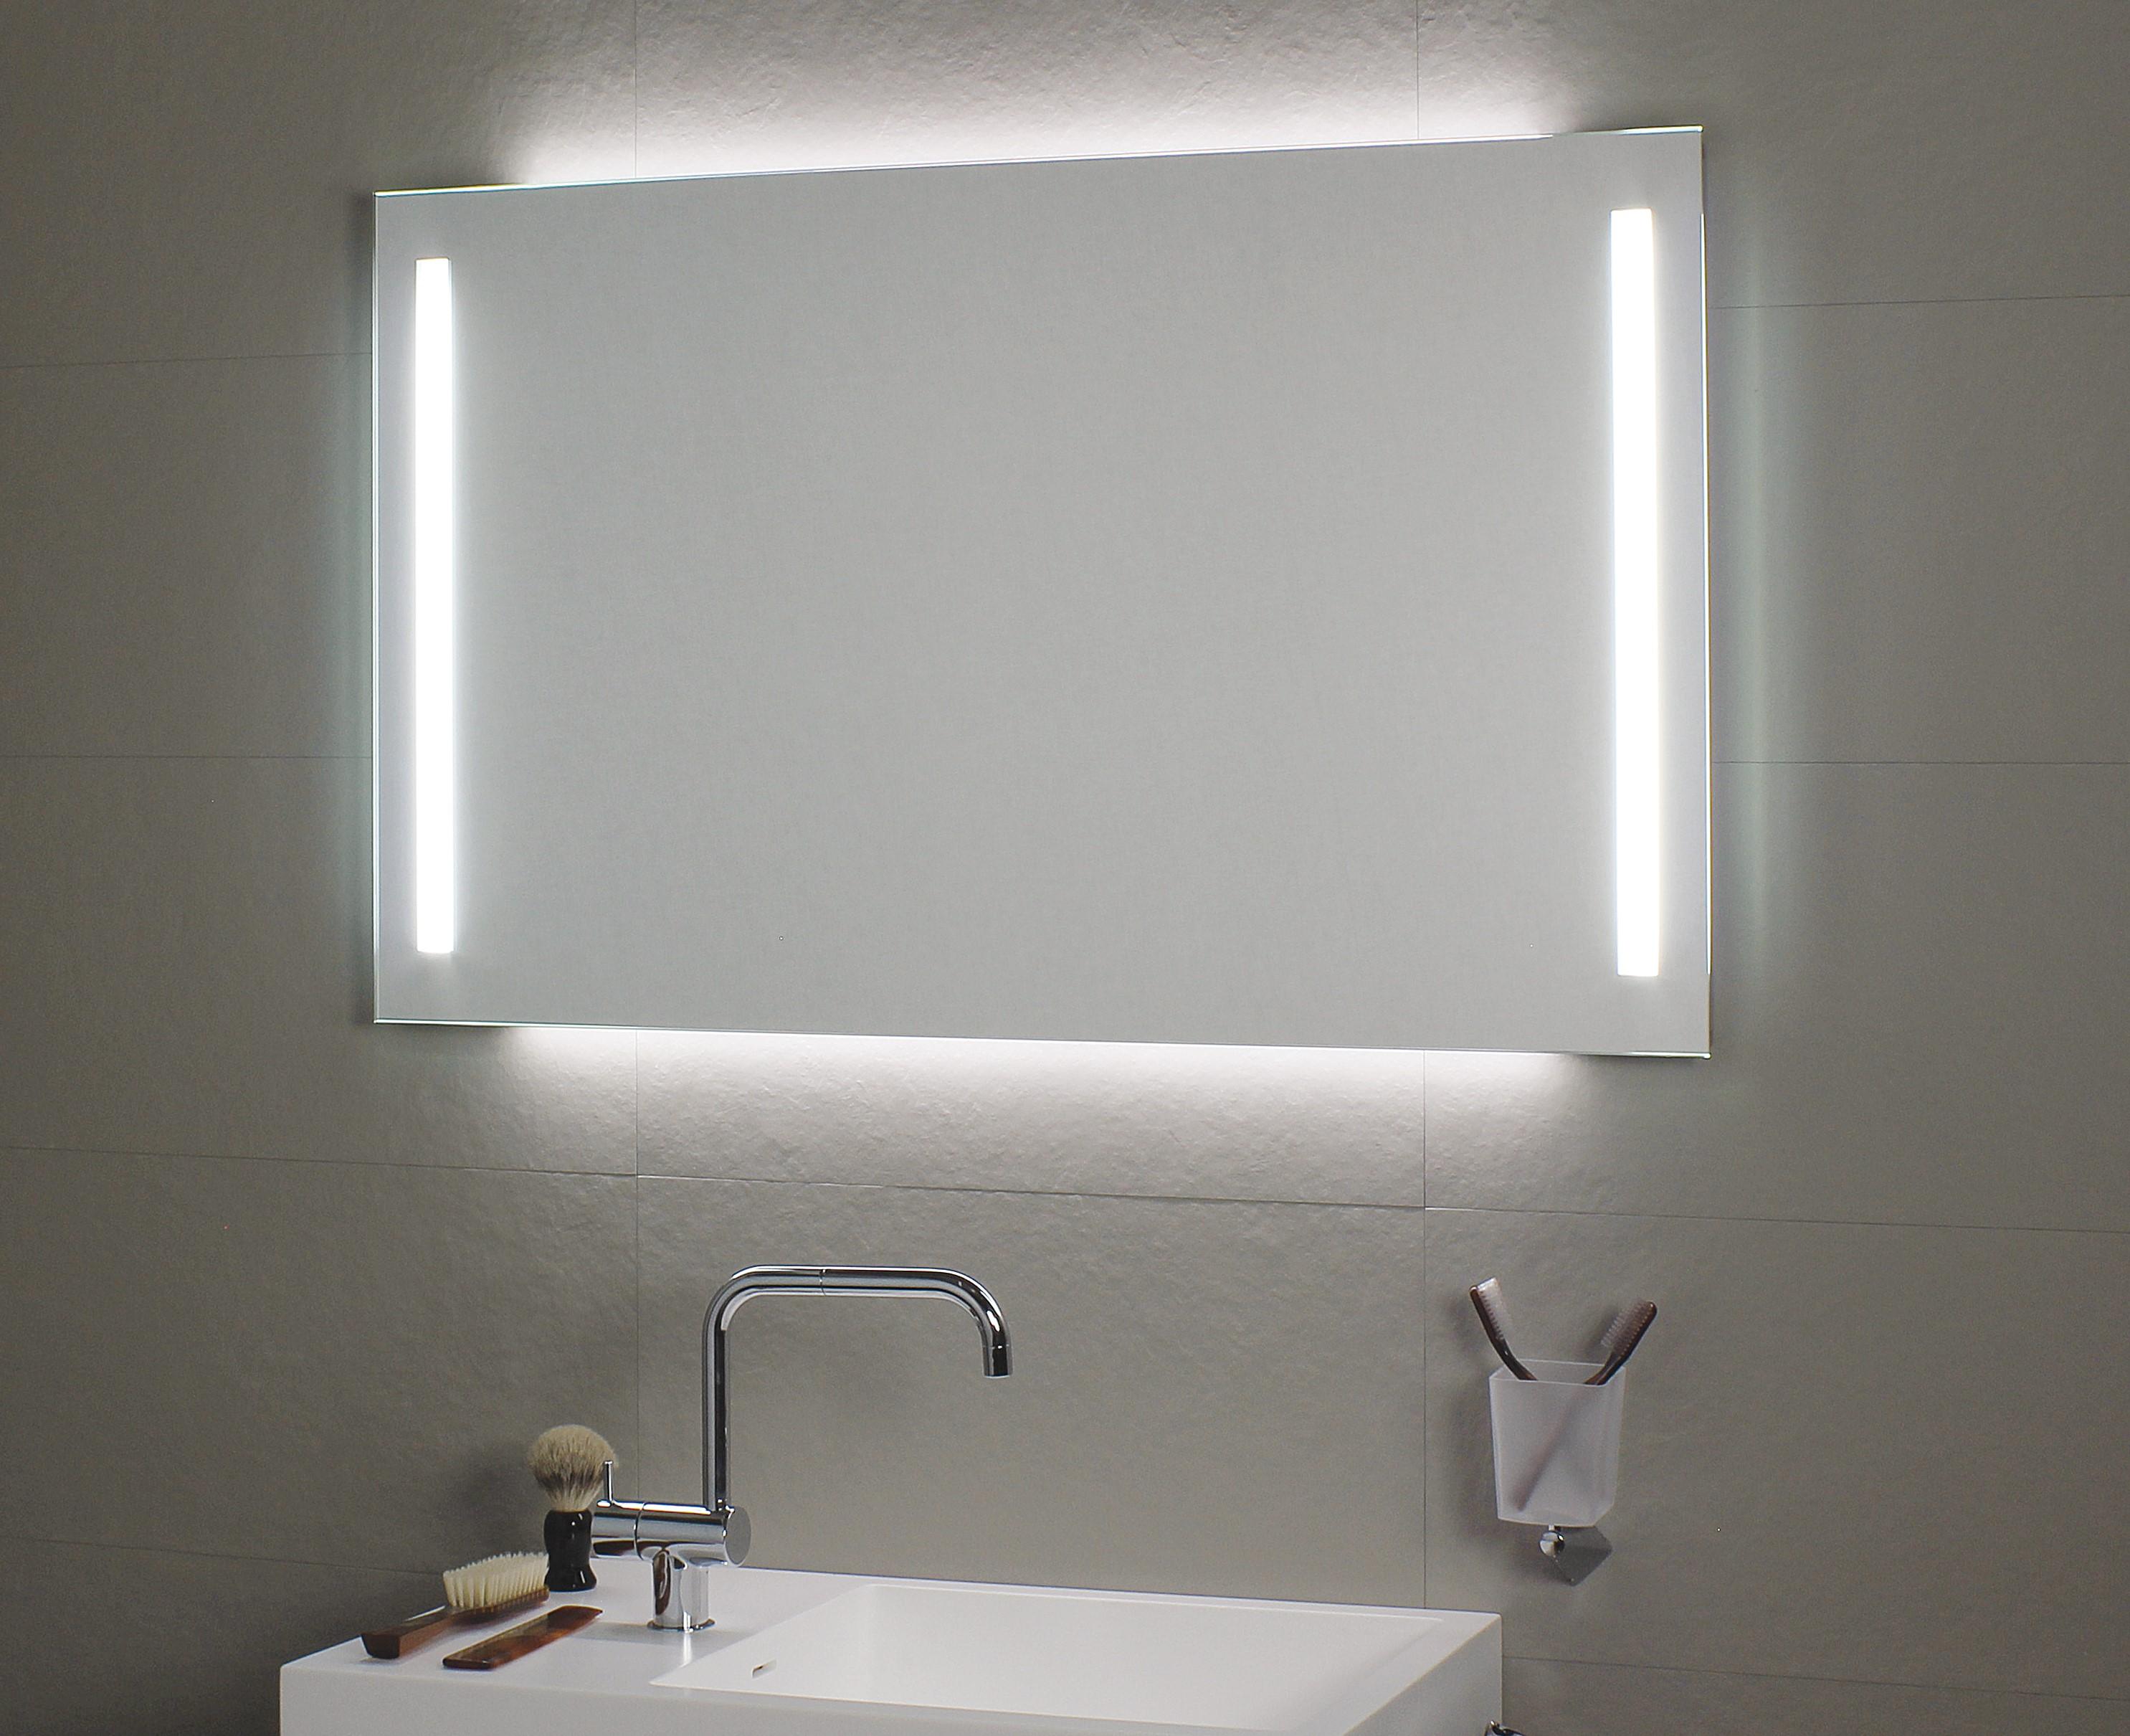 koh i noor duo spiegel mit frontaler led beleuchtung seitlich und indirekter led beleuchtung. Black Bedroom Furniture Sets. Home Design Ideas